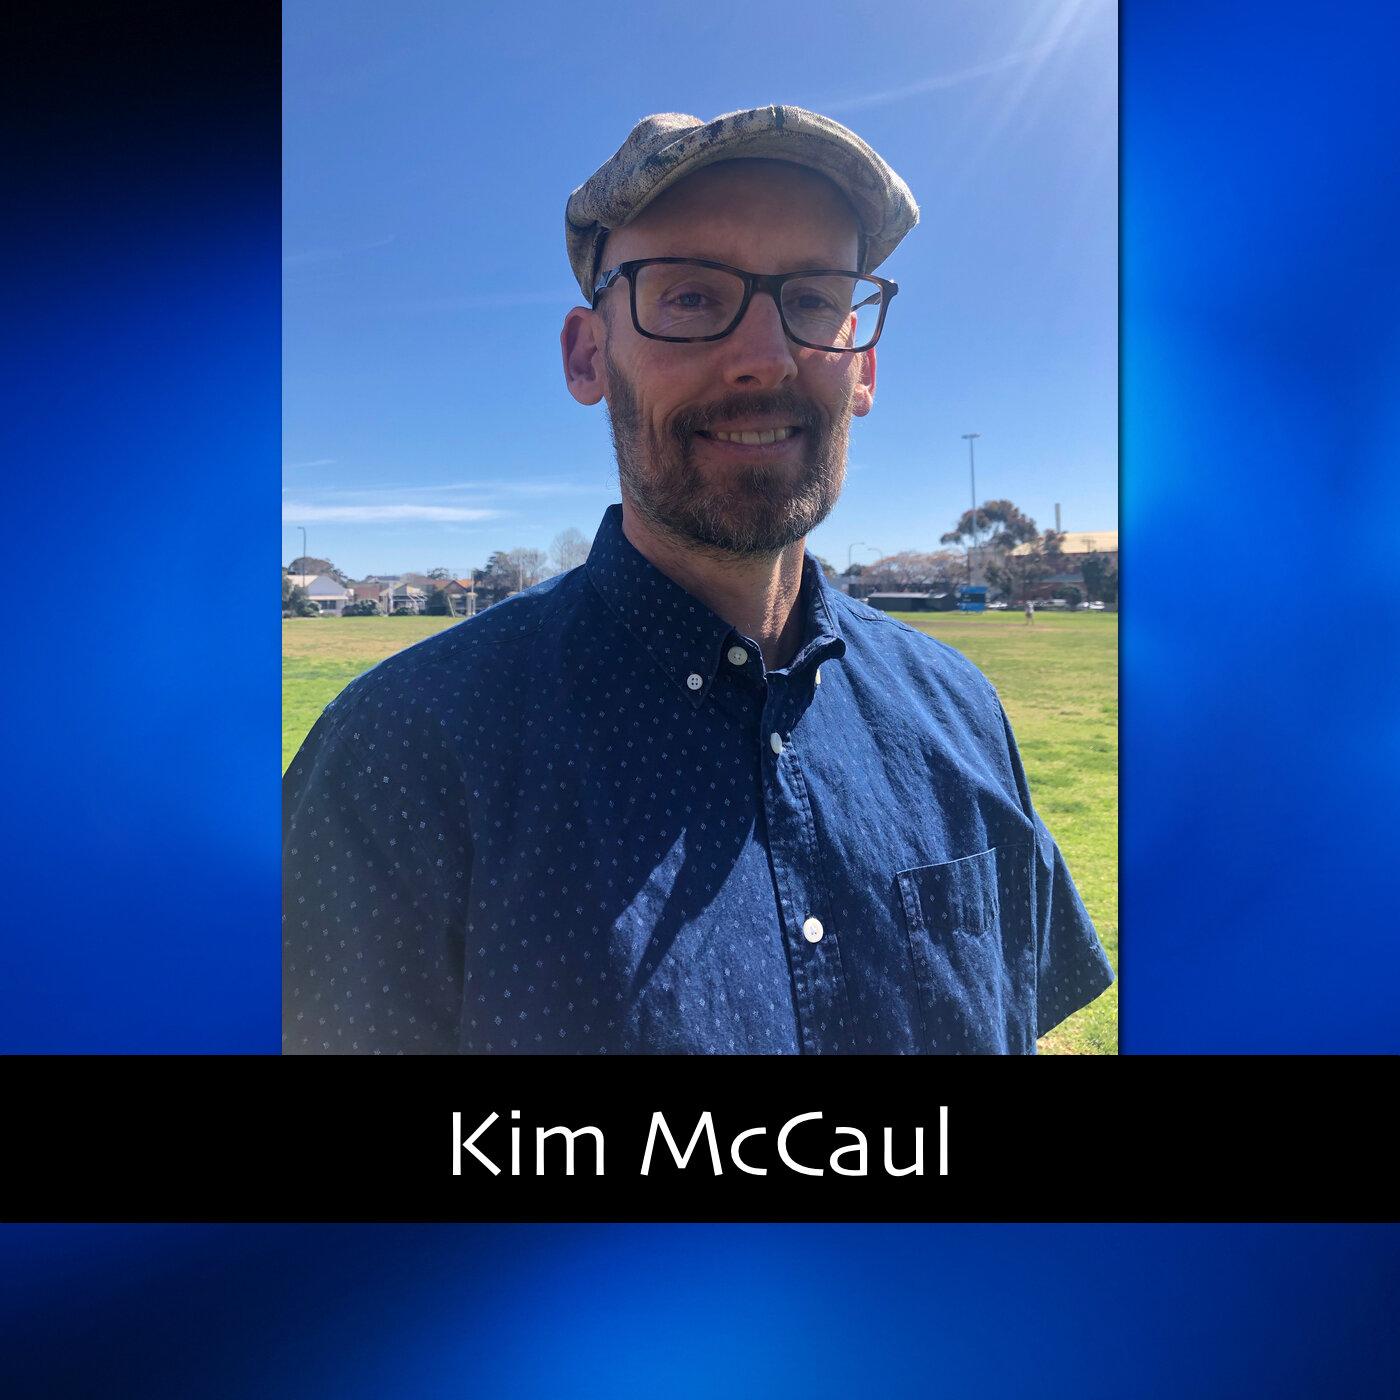 Kim McCaul Thumb.jpg